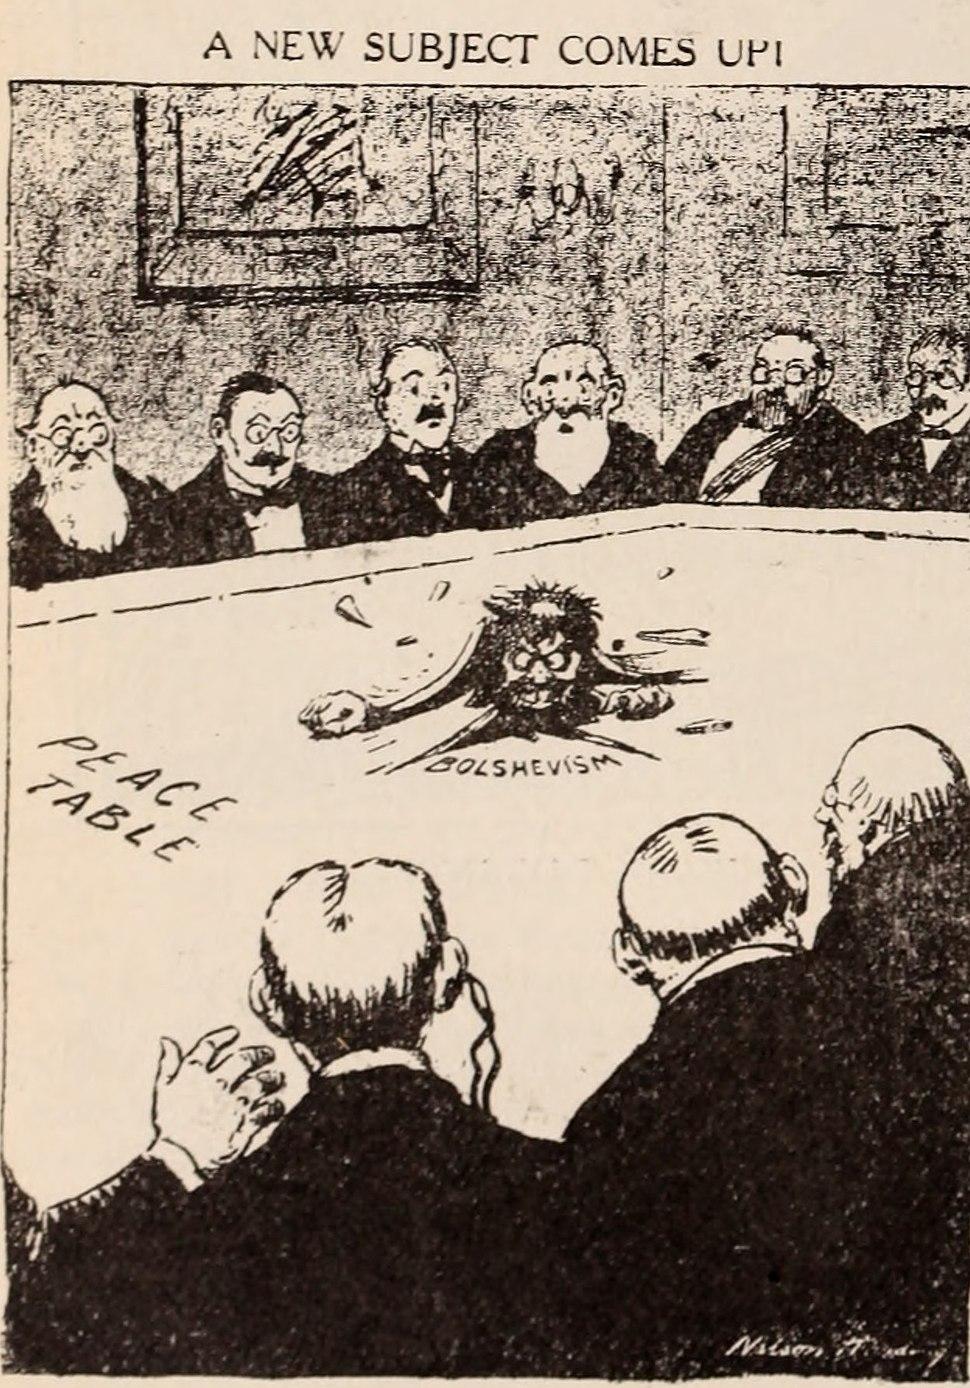 1919 Political Cartoon (14759129762) (cropped)